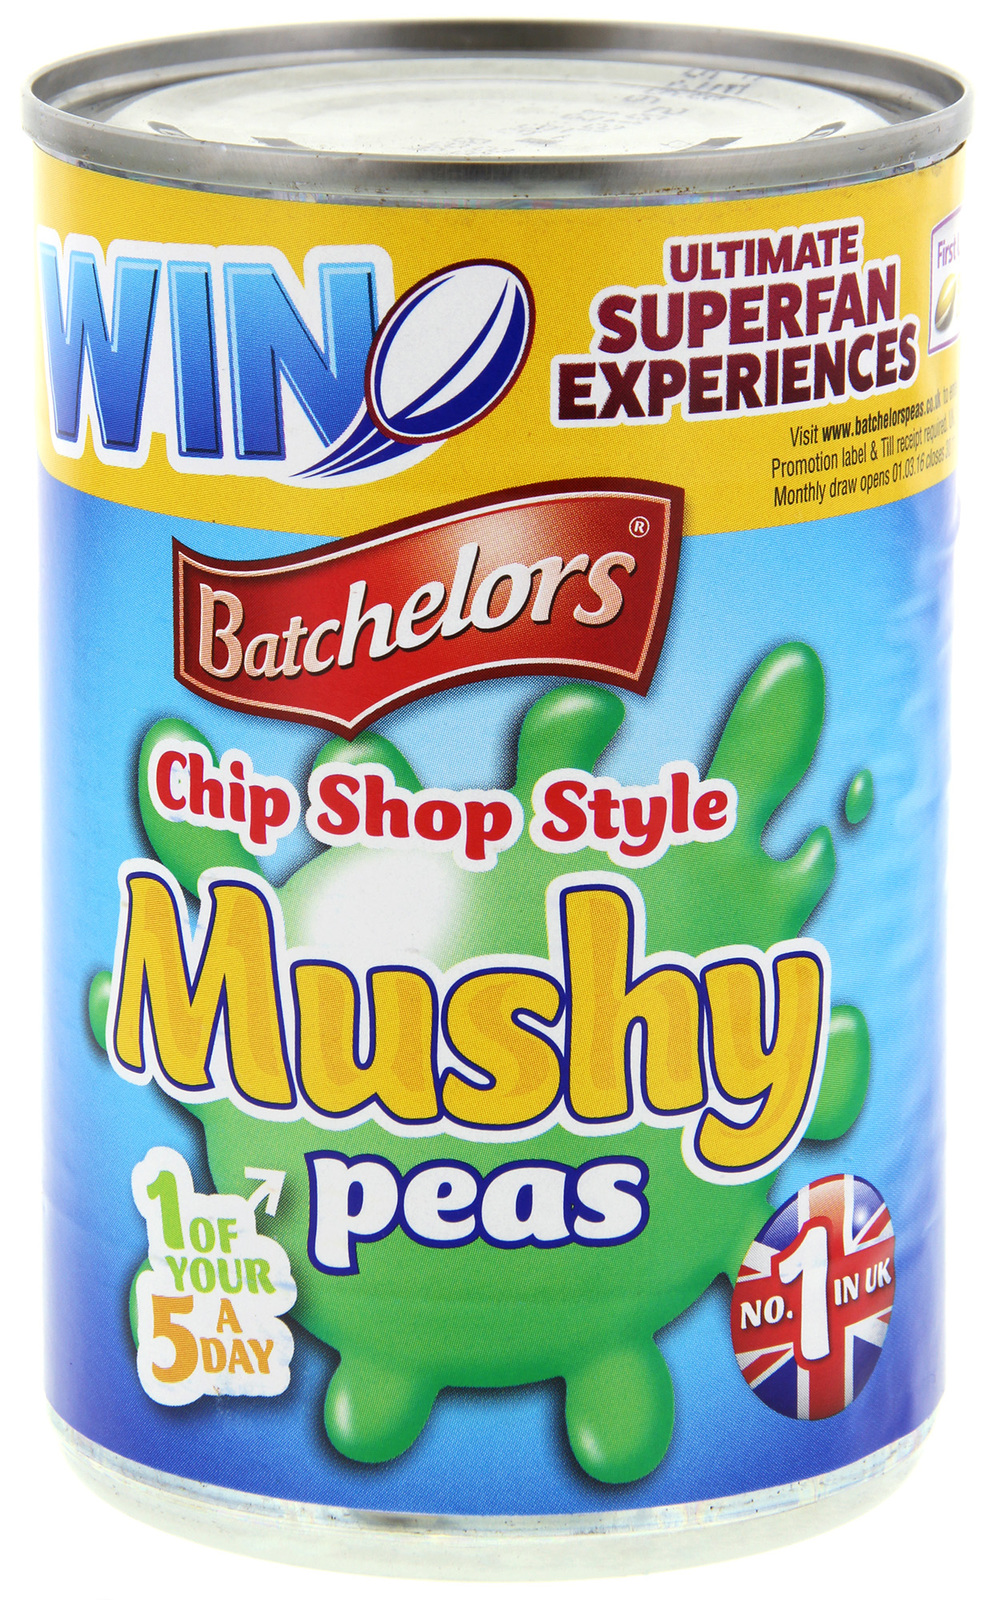 Batchelors Mushy Peas Chip Shop 300g image